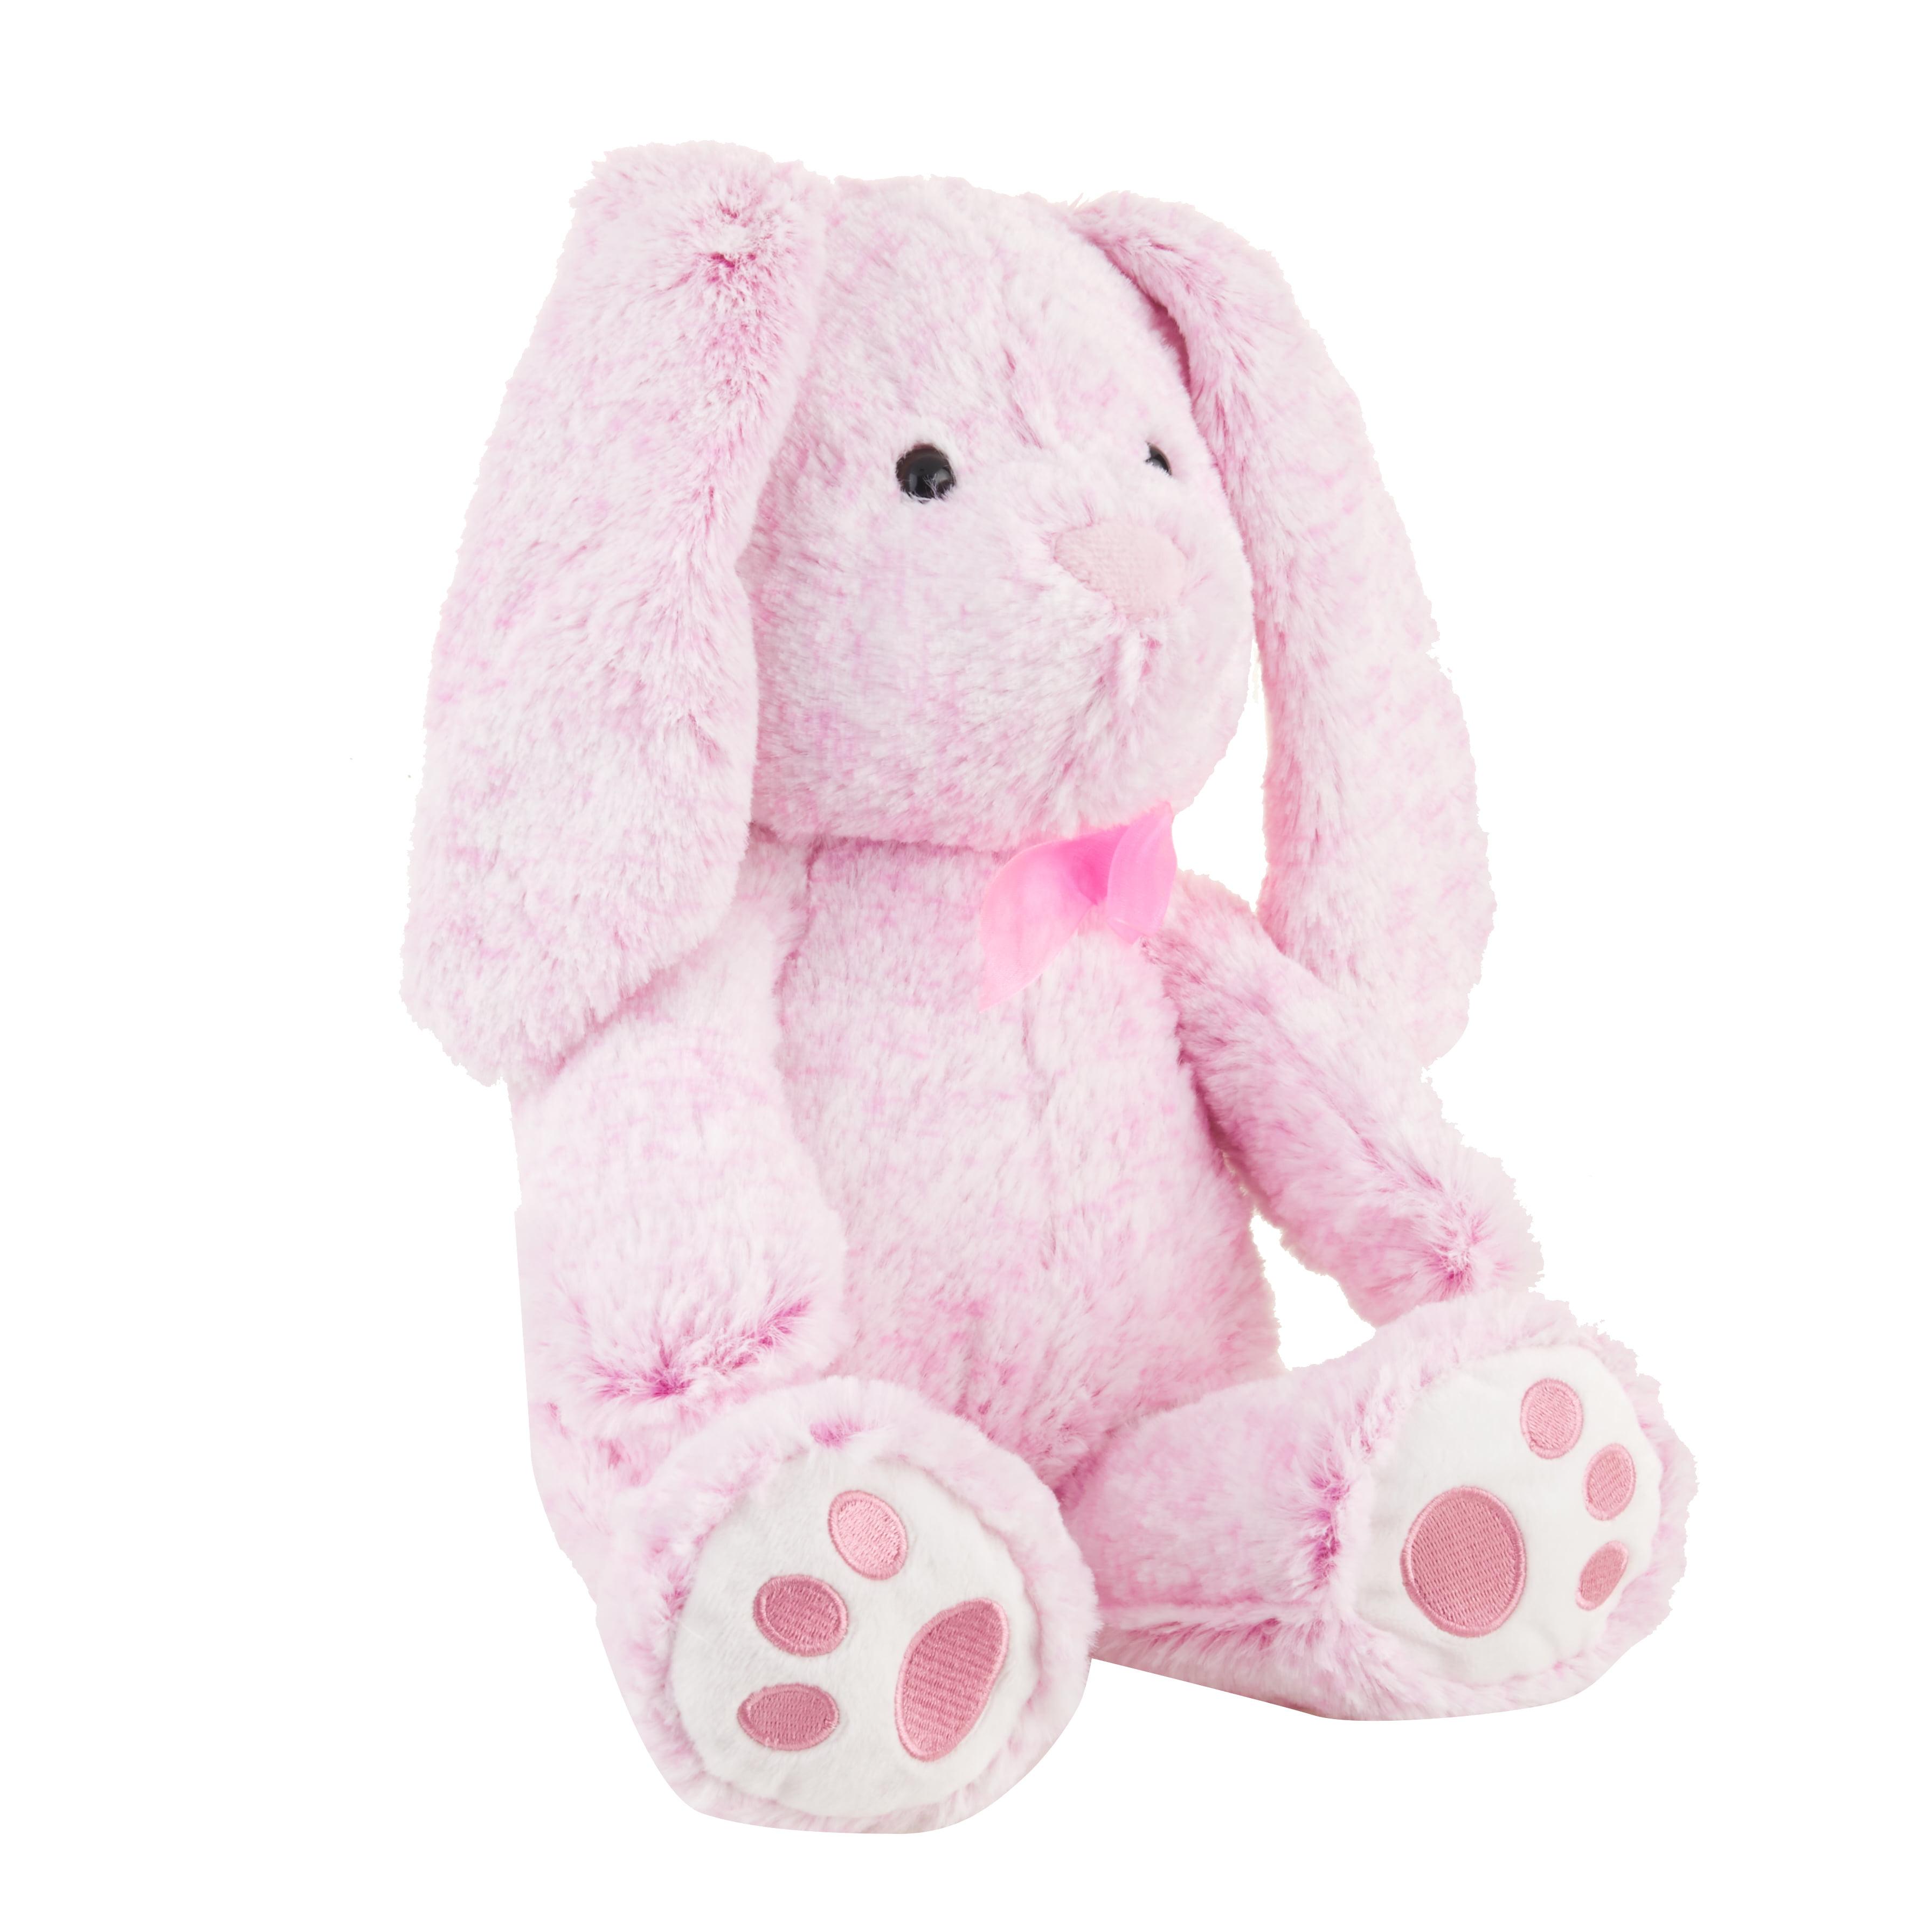 Blue Big Teddy Bear, Hug Fun Plush Pink Lop Ear Bunny Rabbit 13 In Stuffed Animal Pal Brickseek